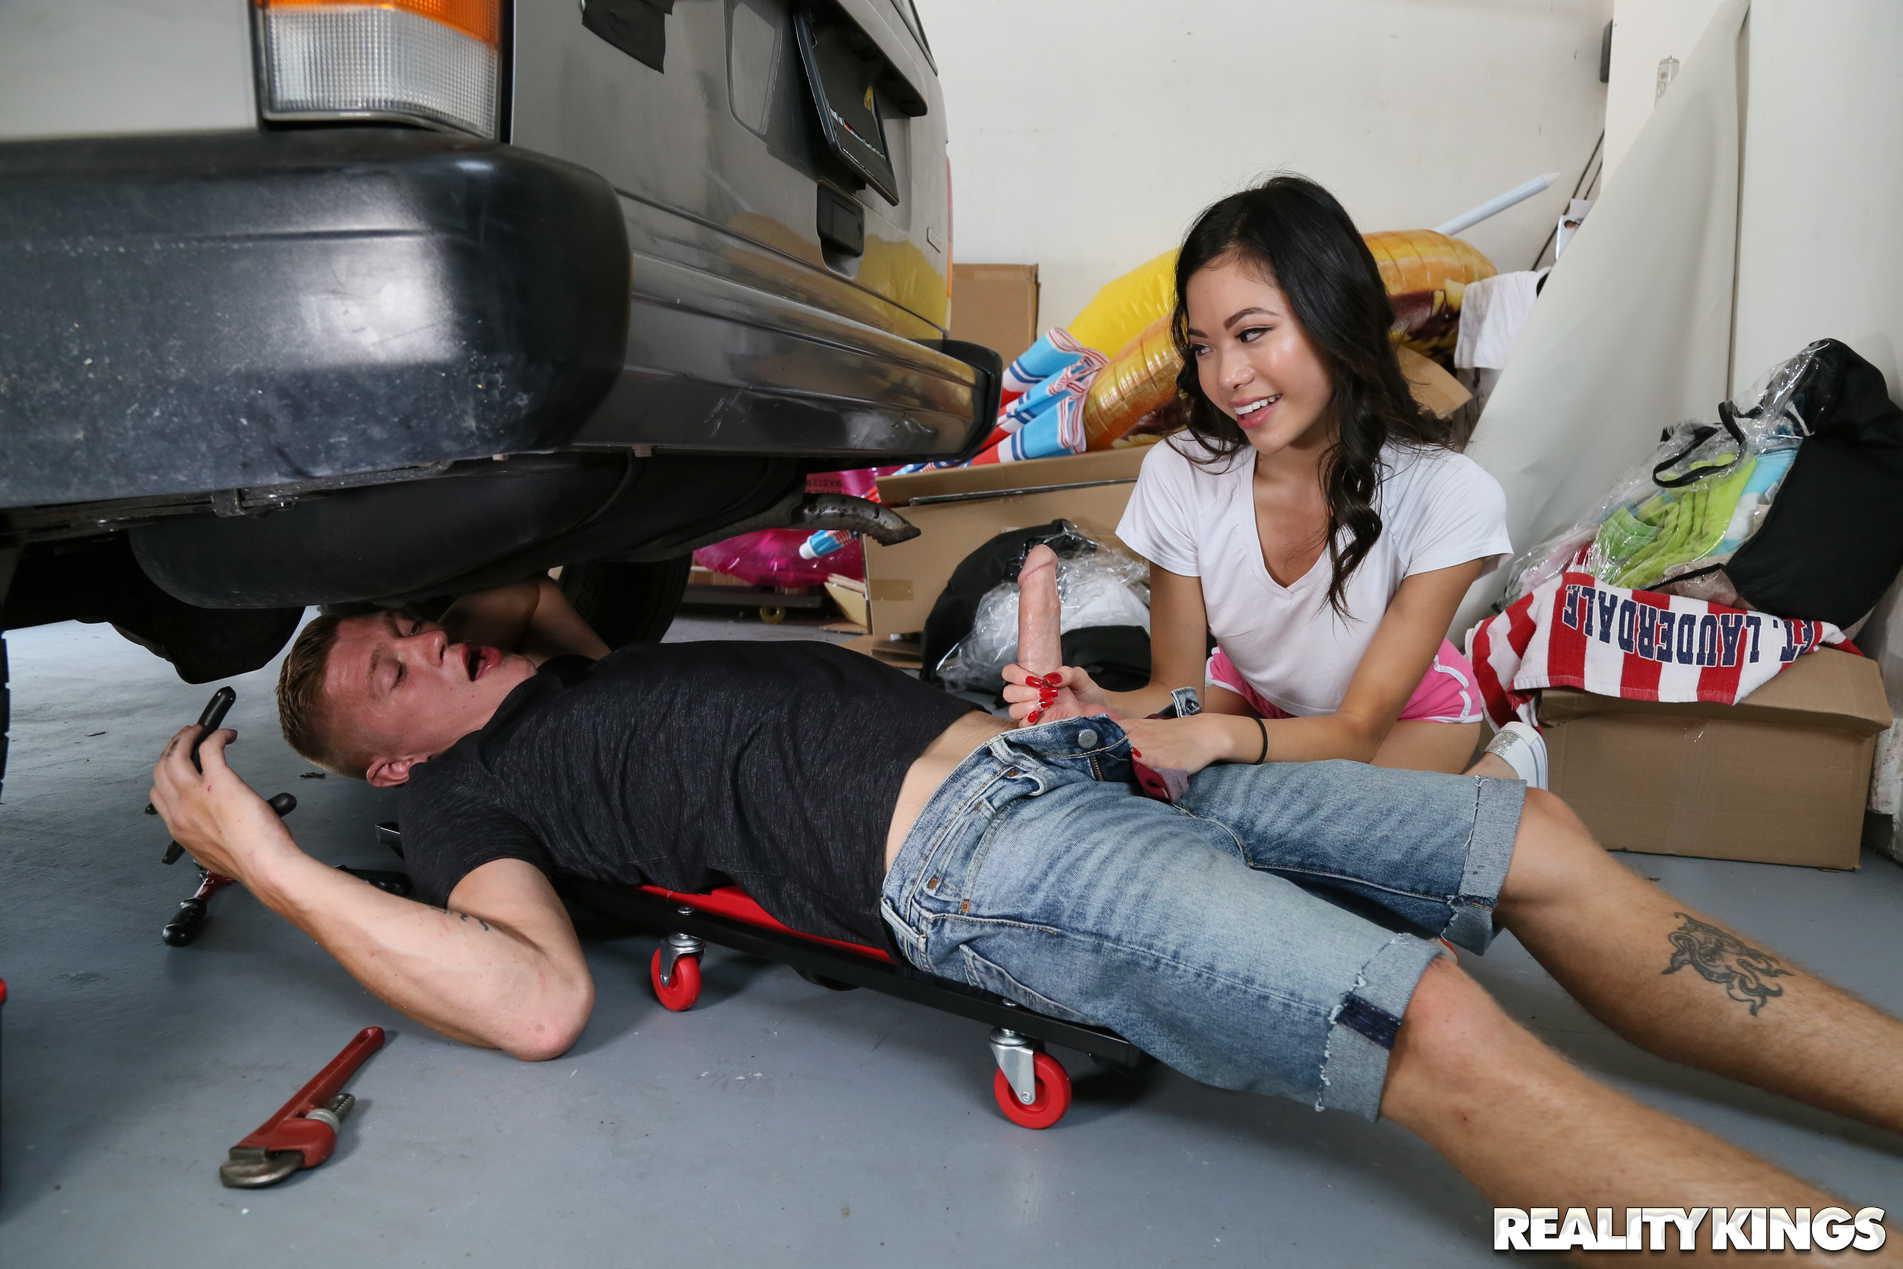 Reality Kings 'Mechanic Appreciation' starring Lexi Luna (Photo 99)